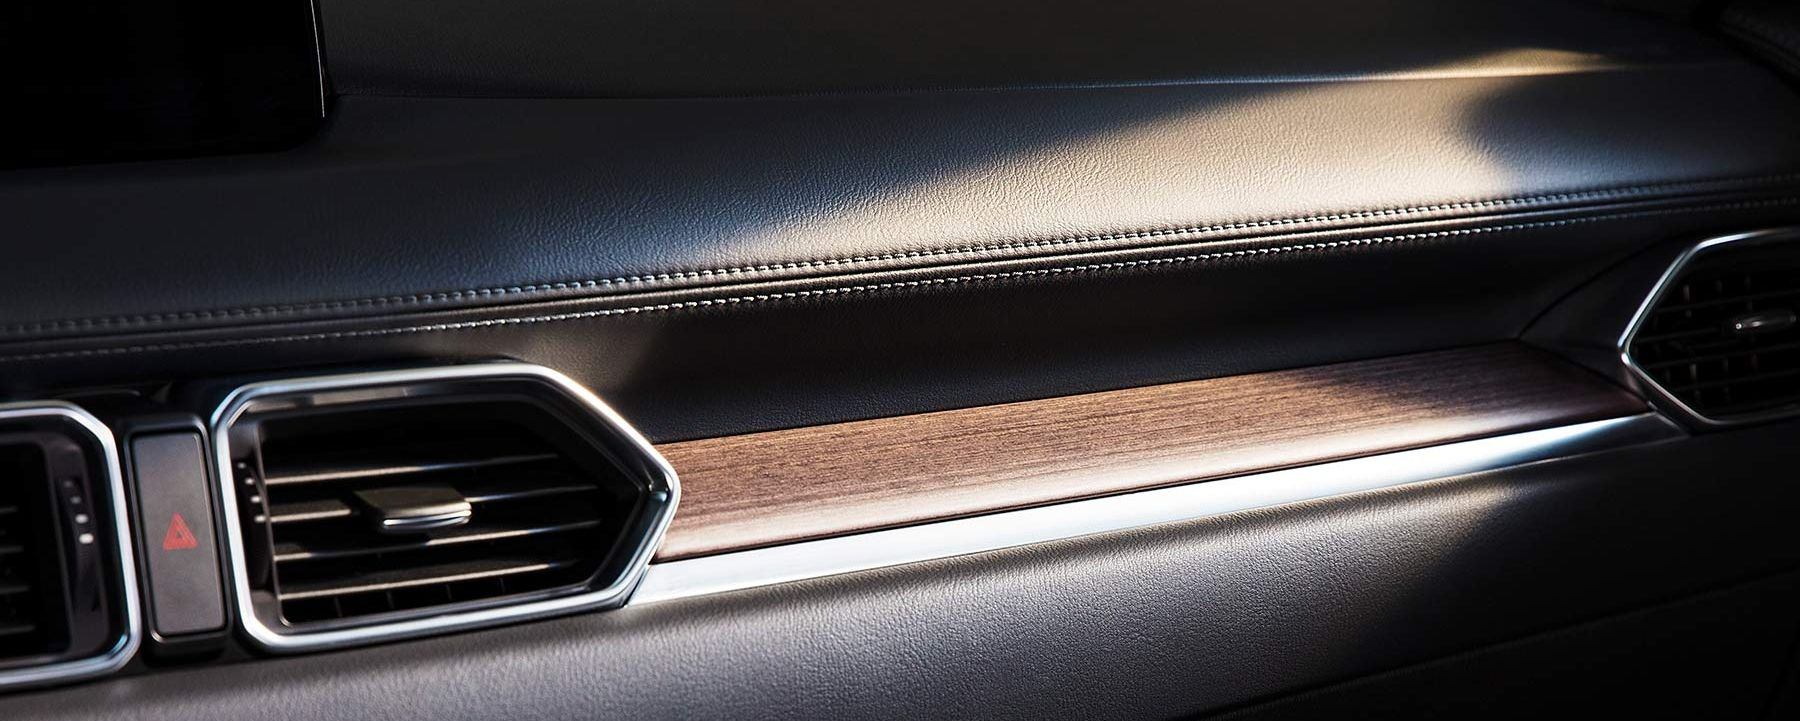 Exquisite Detailing in the Mazda CX-5